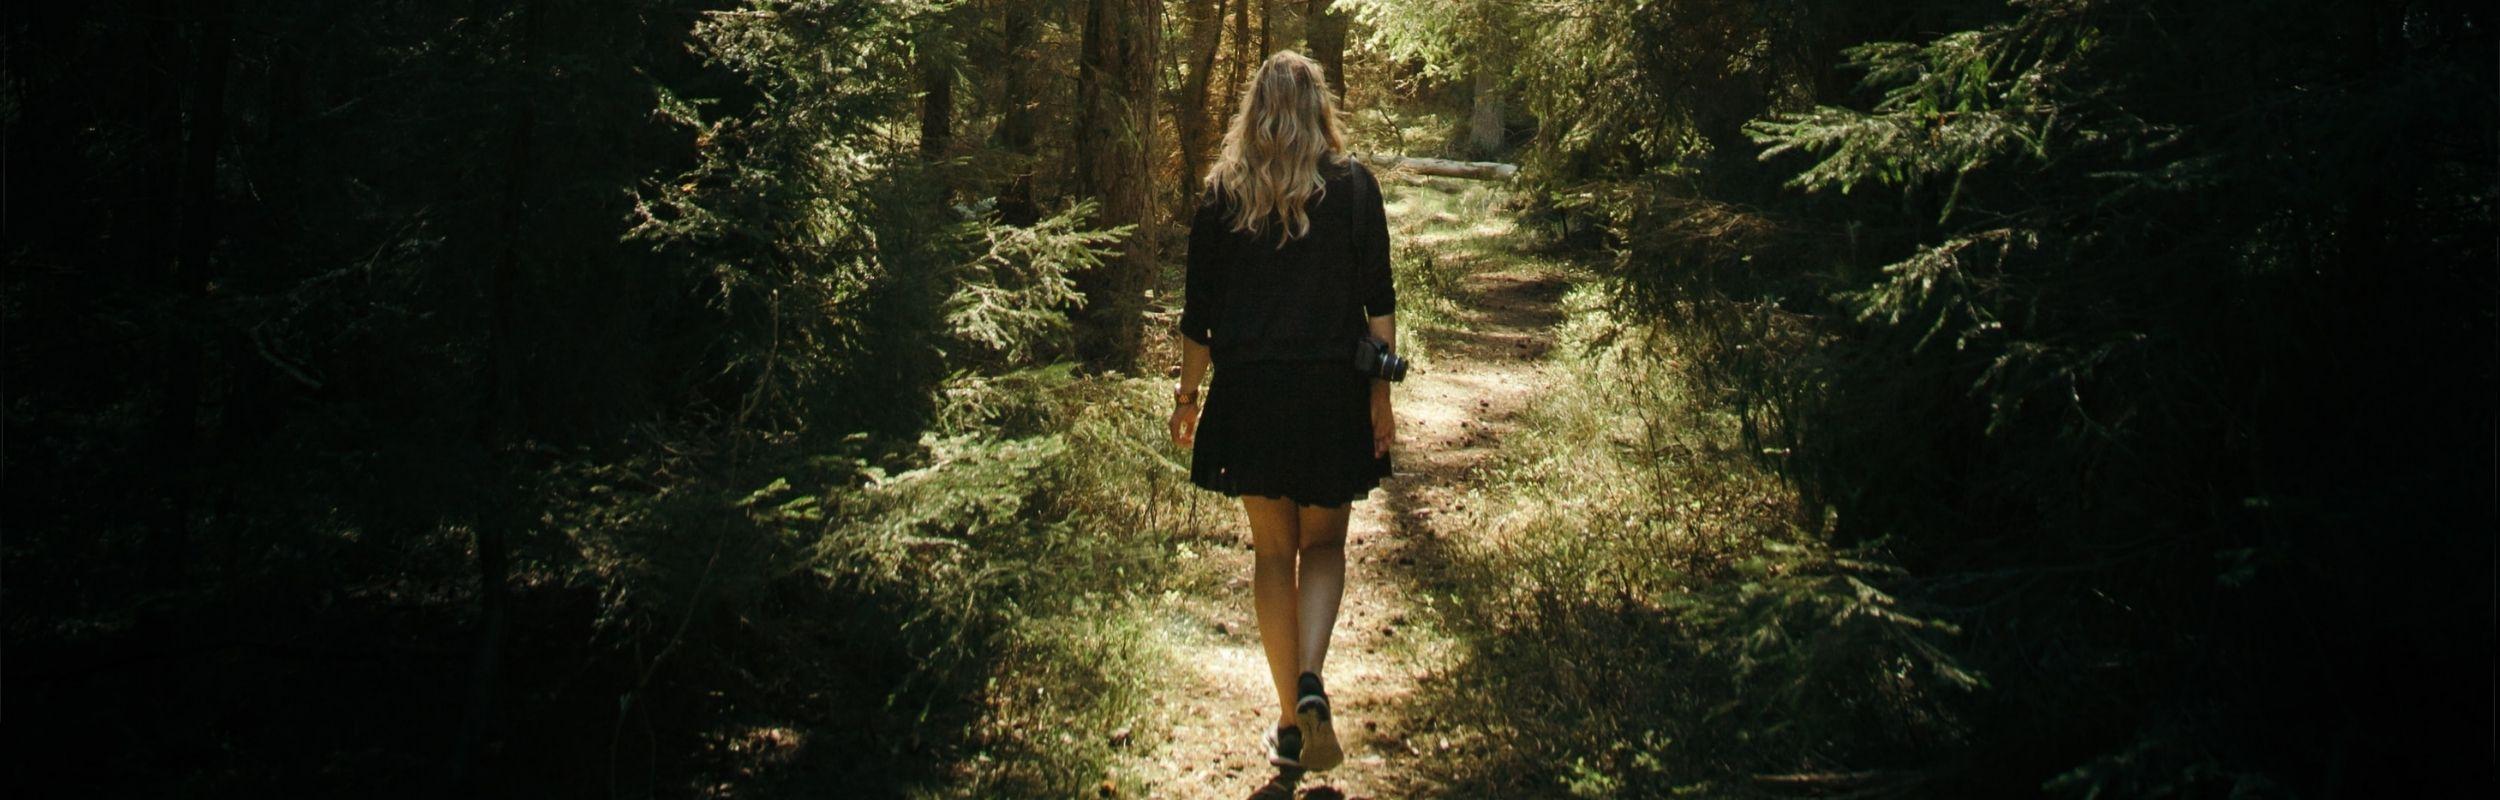 Slowlife, ralentir et aller dans la nature